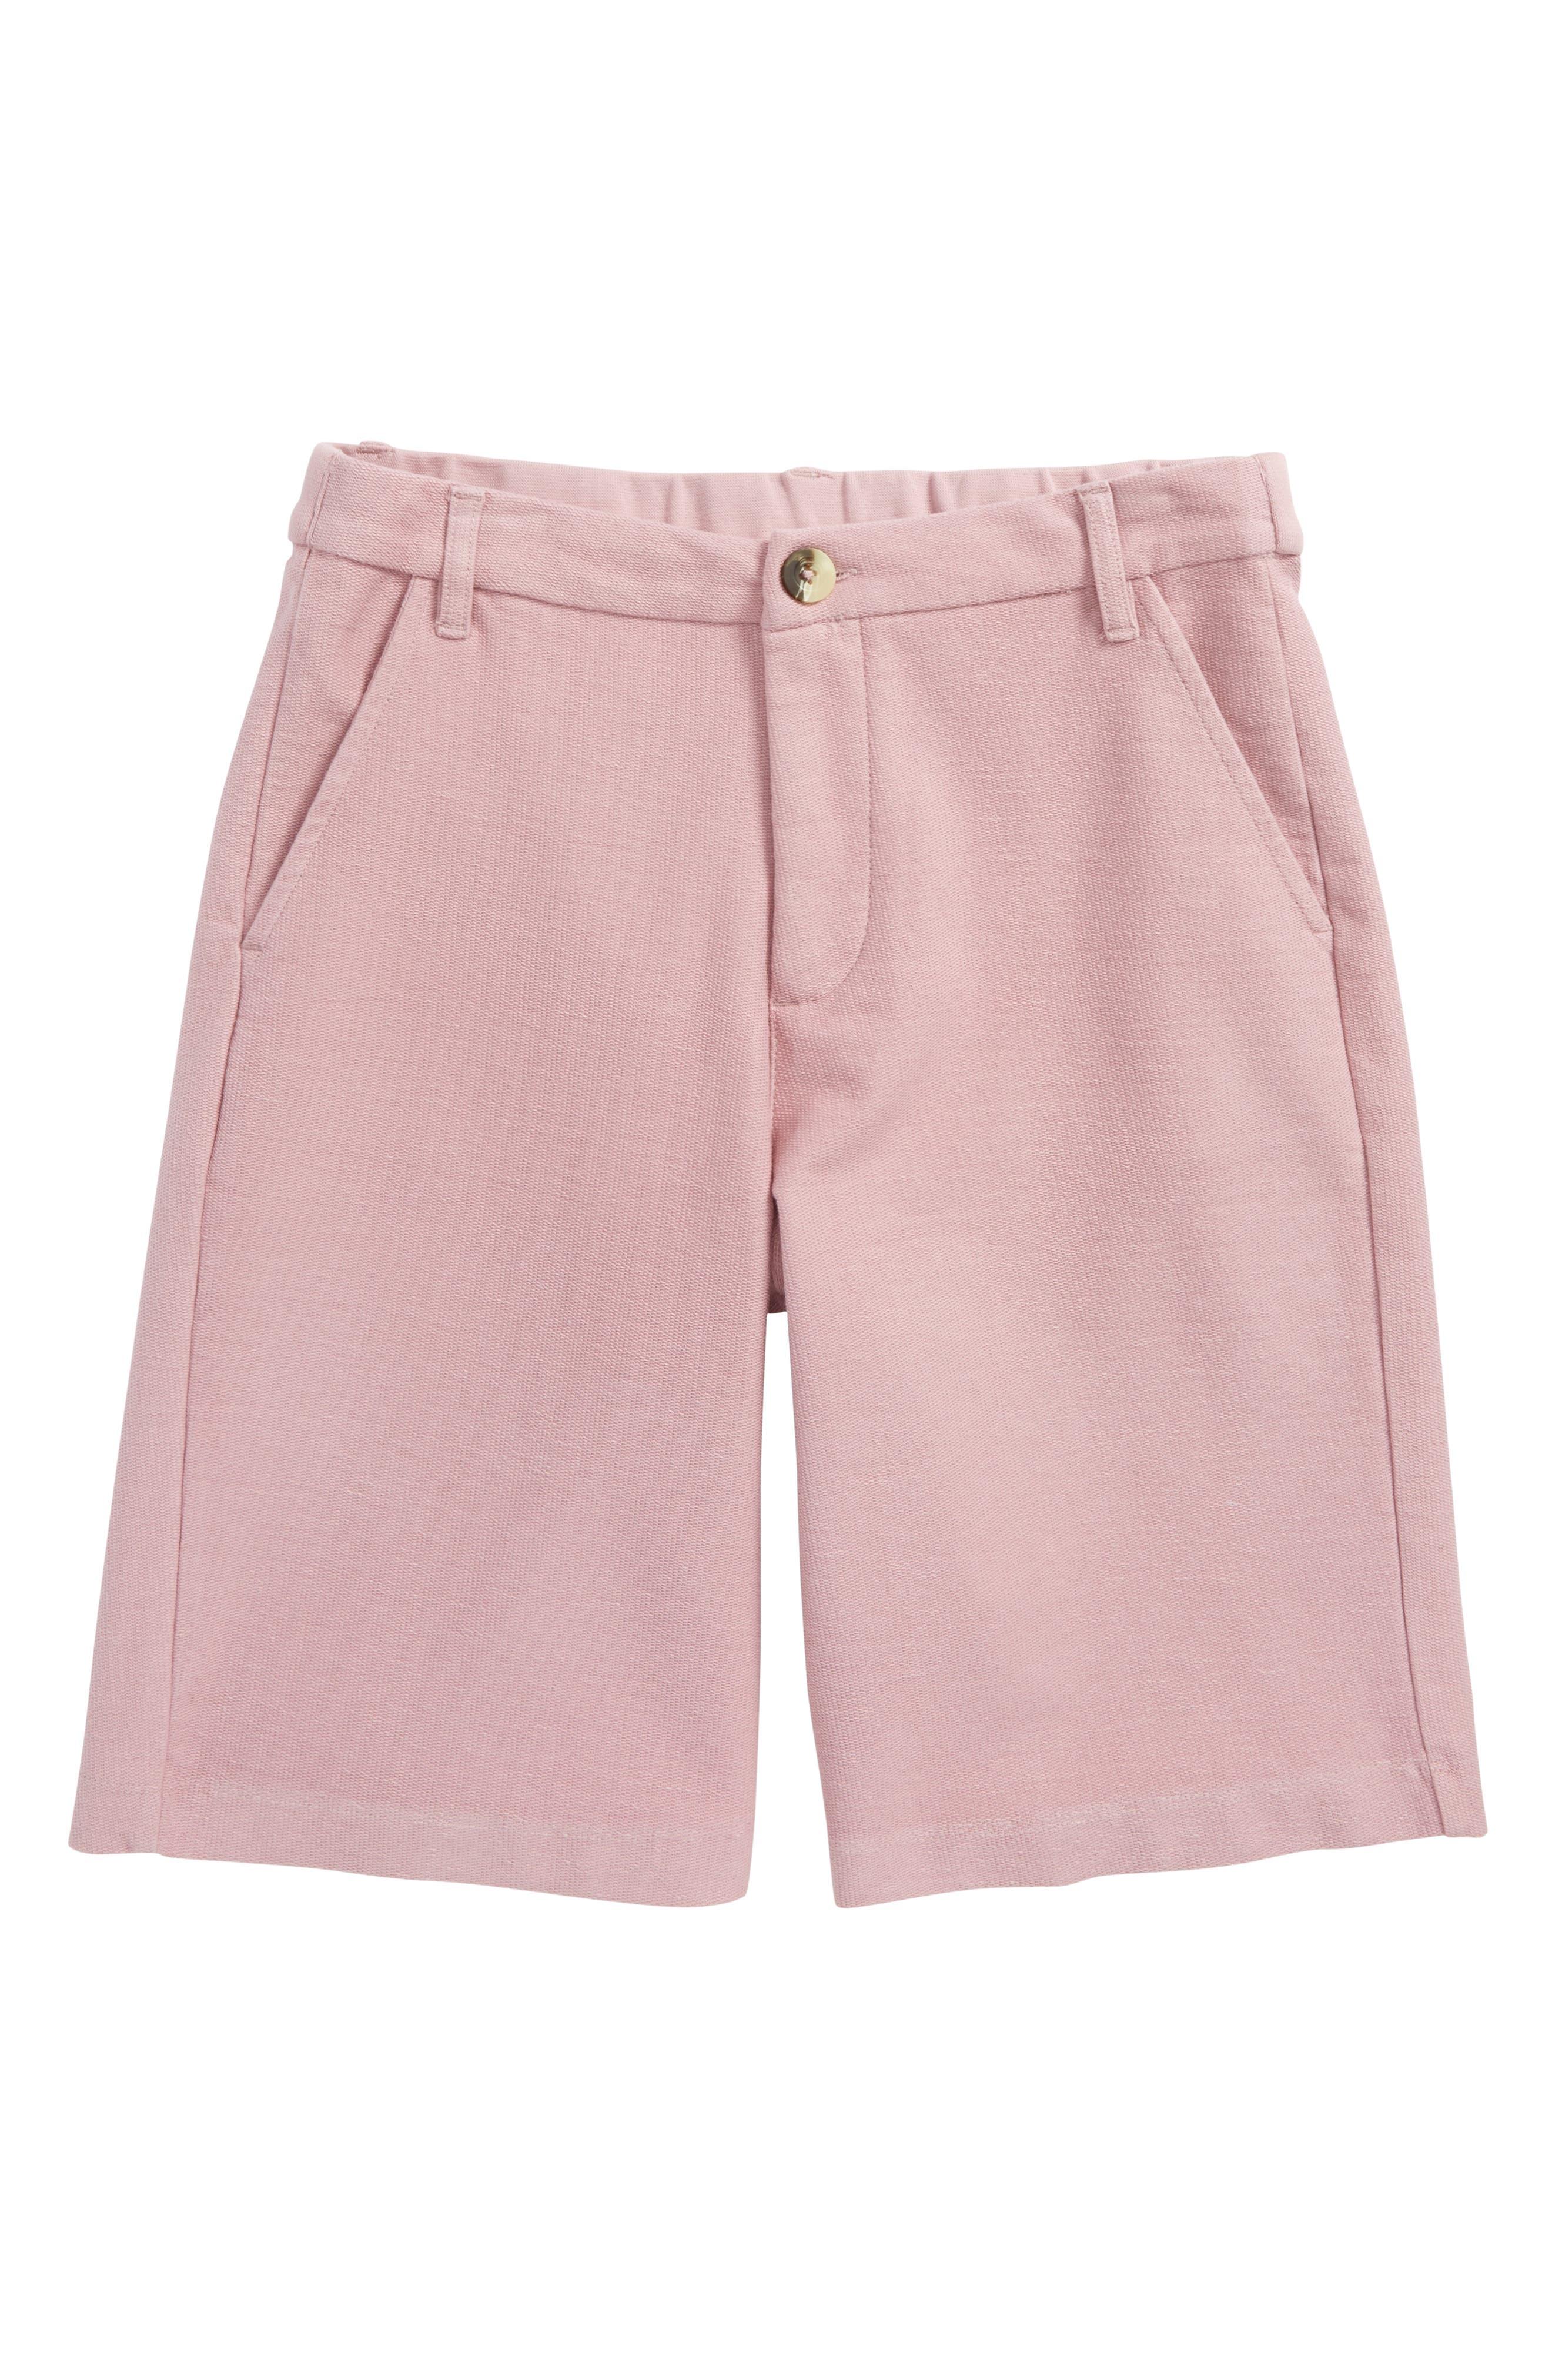 Easton Jersey Shorts,                             Main thumbnail 1, color,                             Mauve